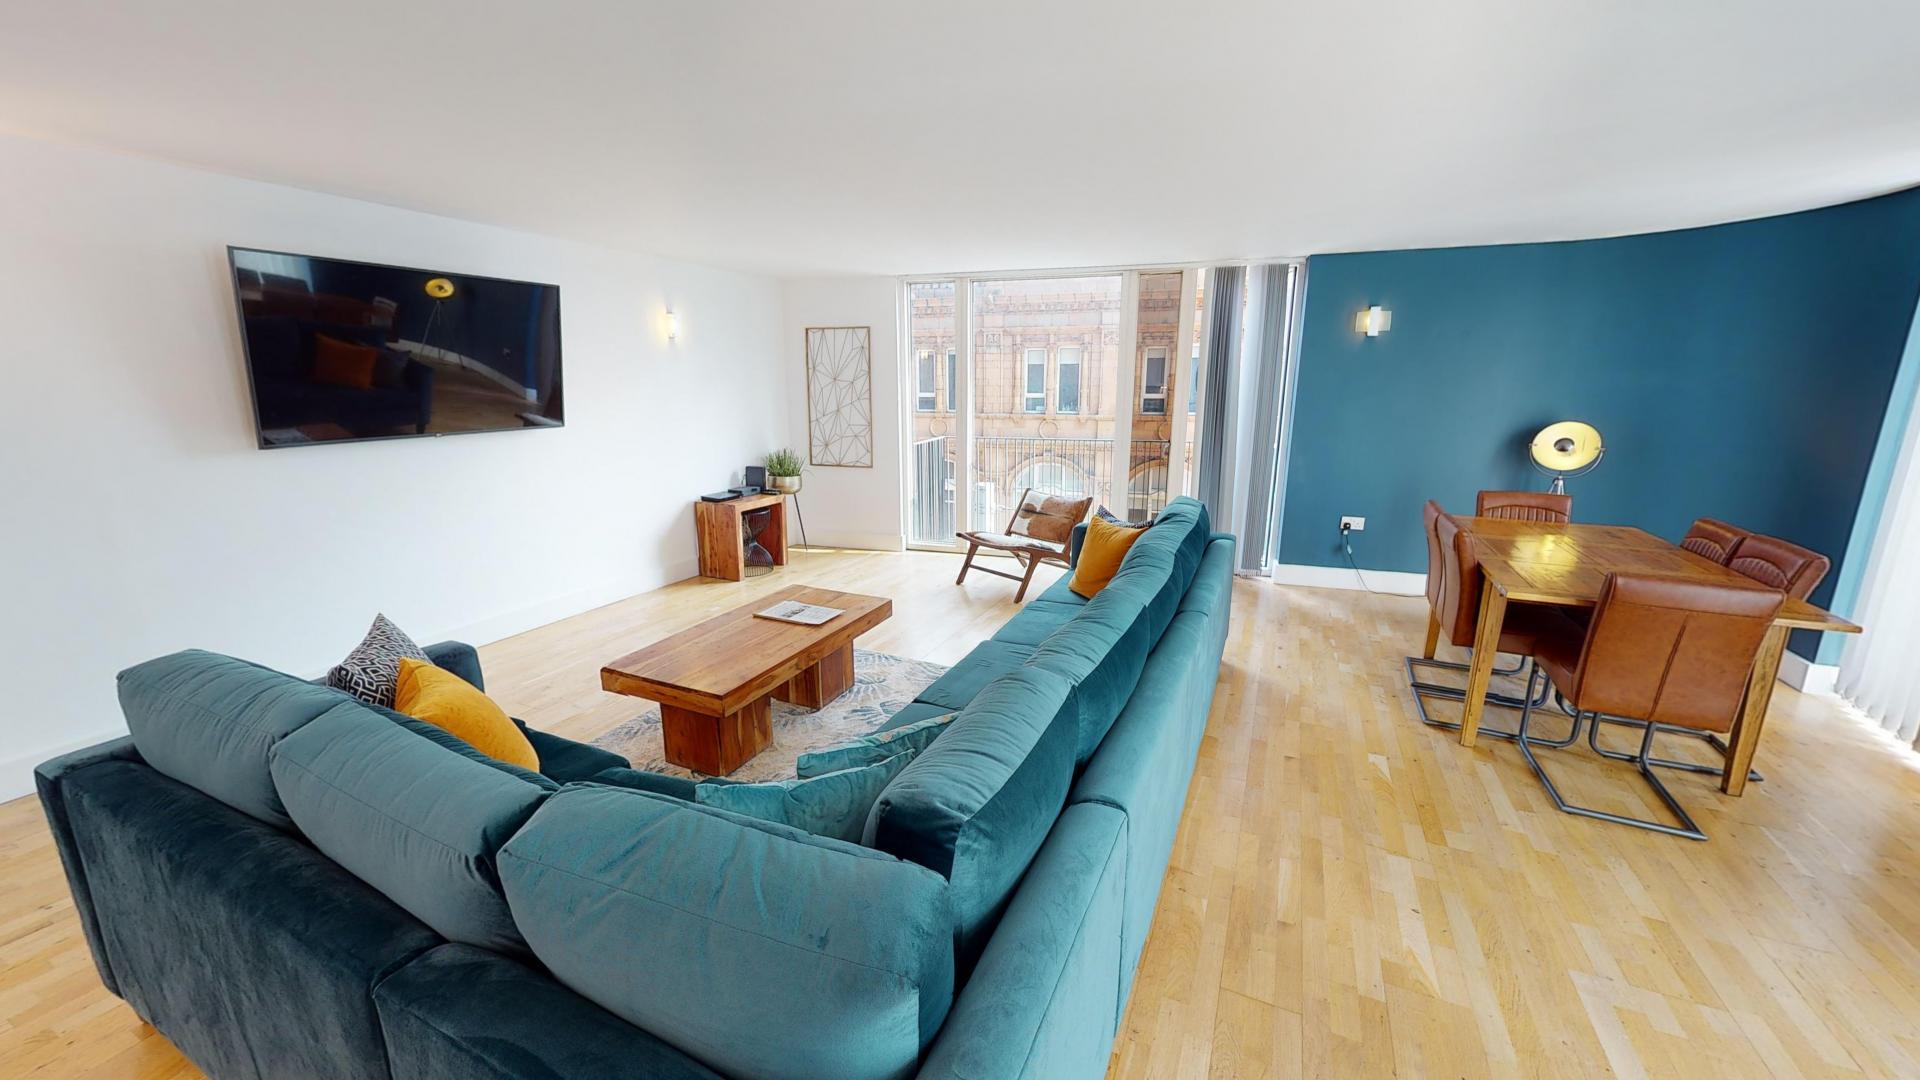 TV at Sinclair Apartments, Centre, Sheffield - Citybase Apartments